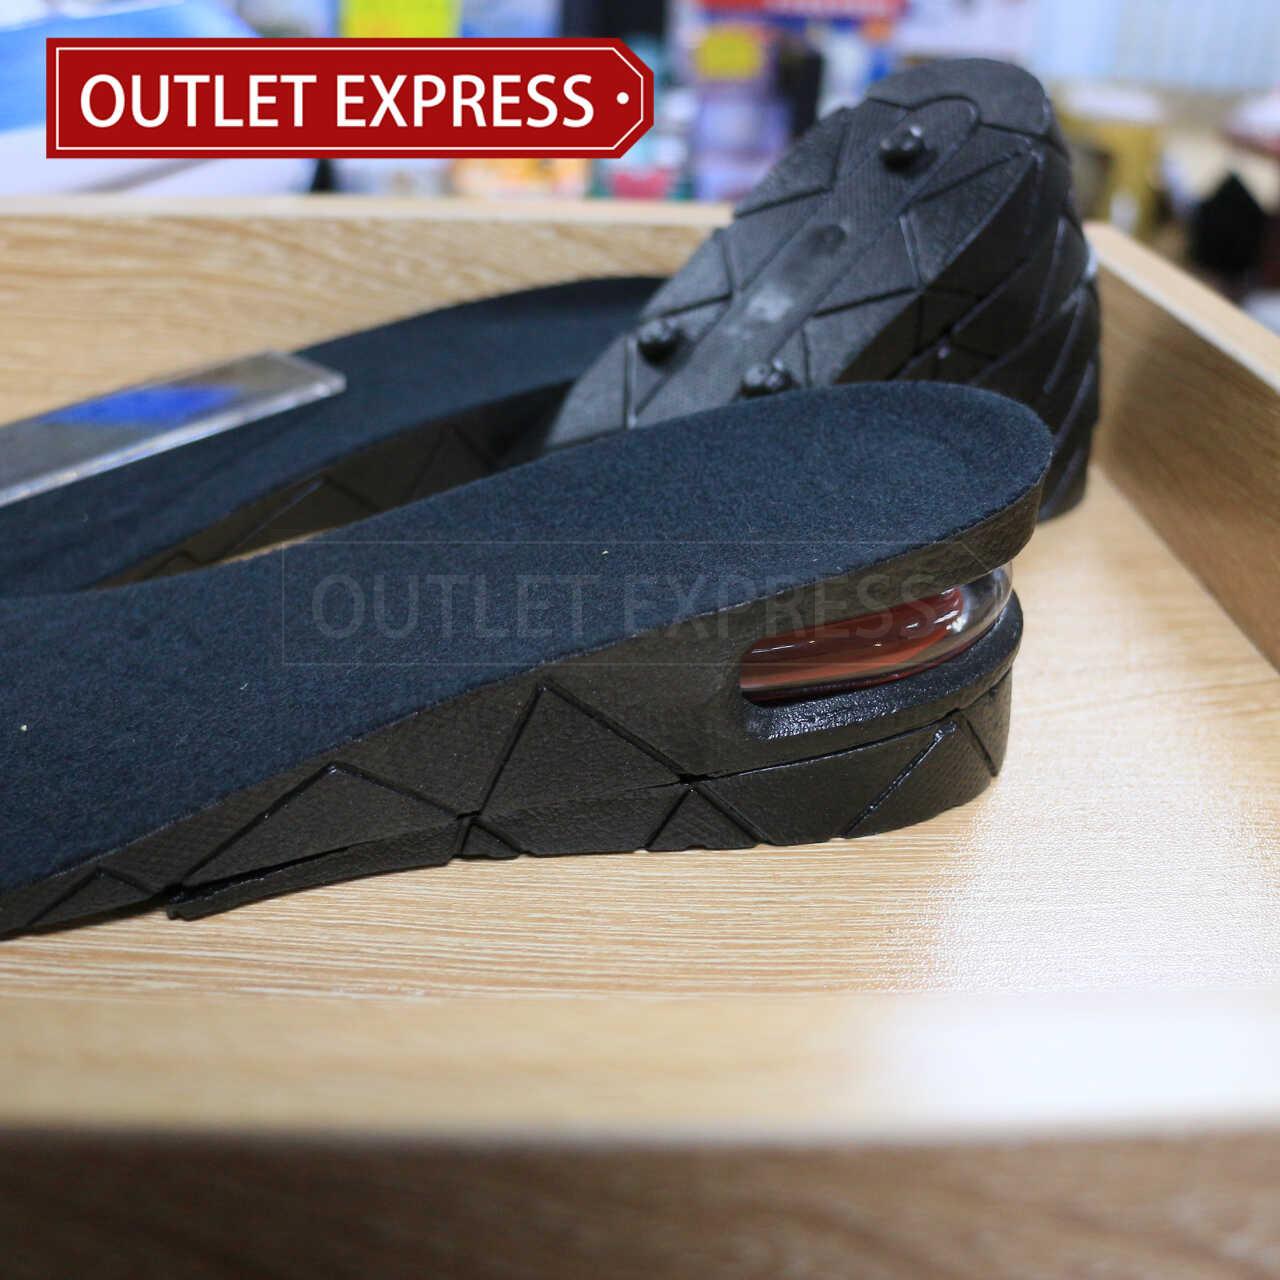 PU防震隱形內增高鞋墊|  4層可調節增高9CM - Outlet Express HK生活百貨城實拍相片